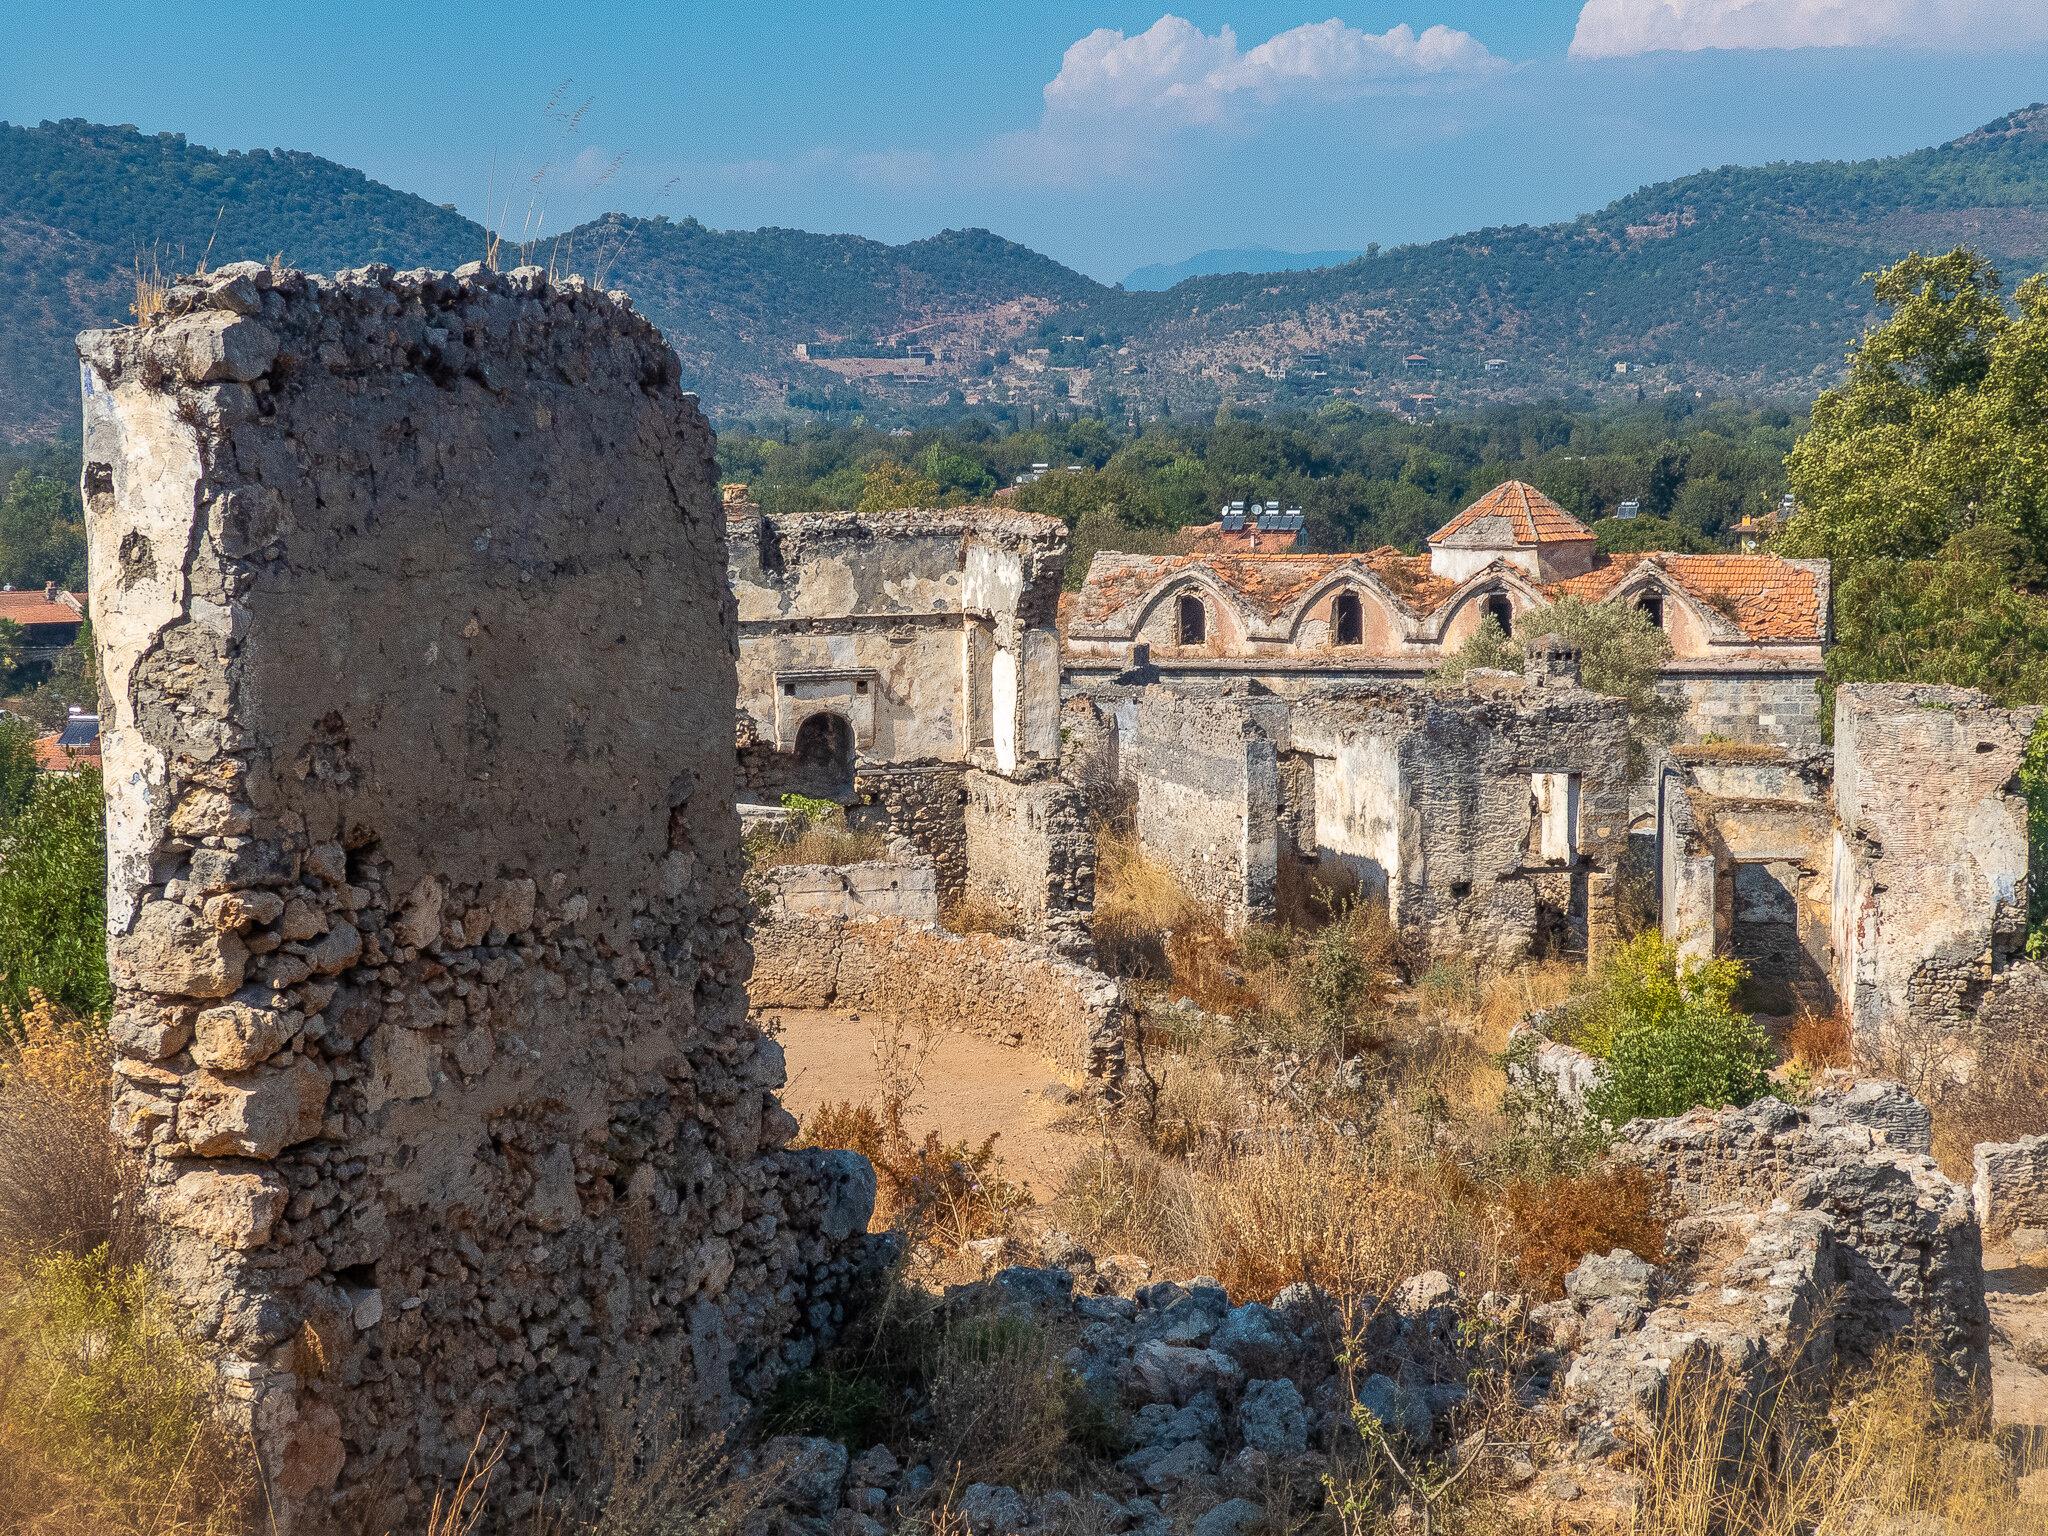 More ruined buildings